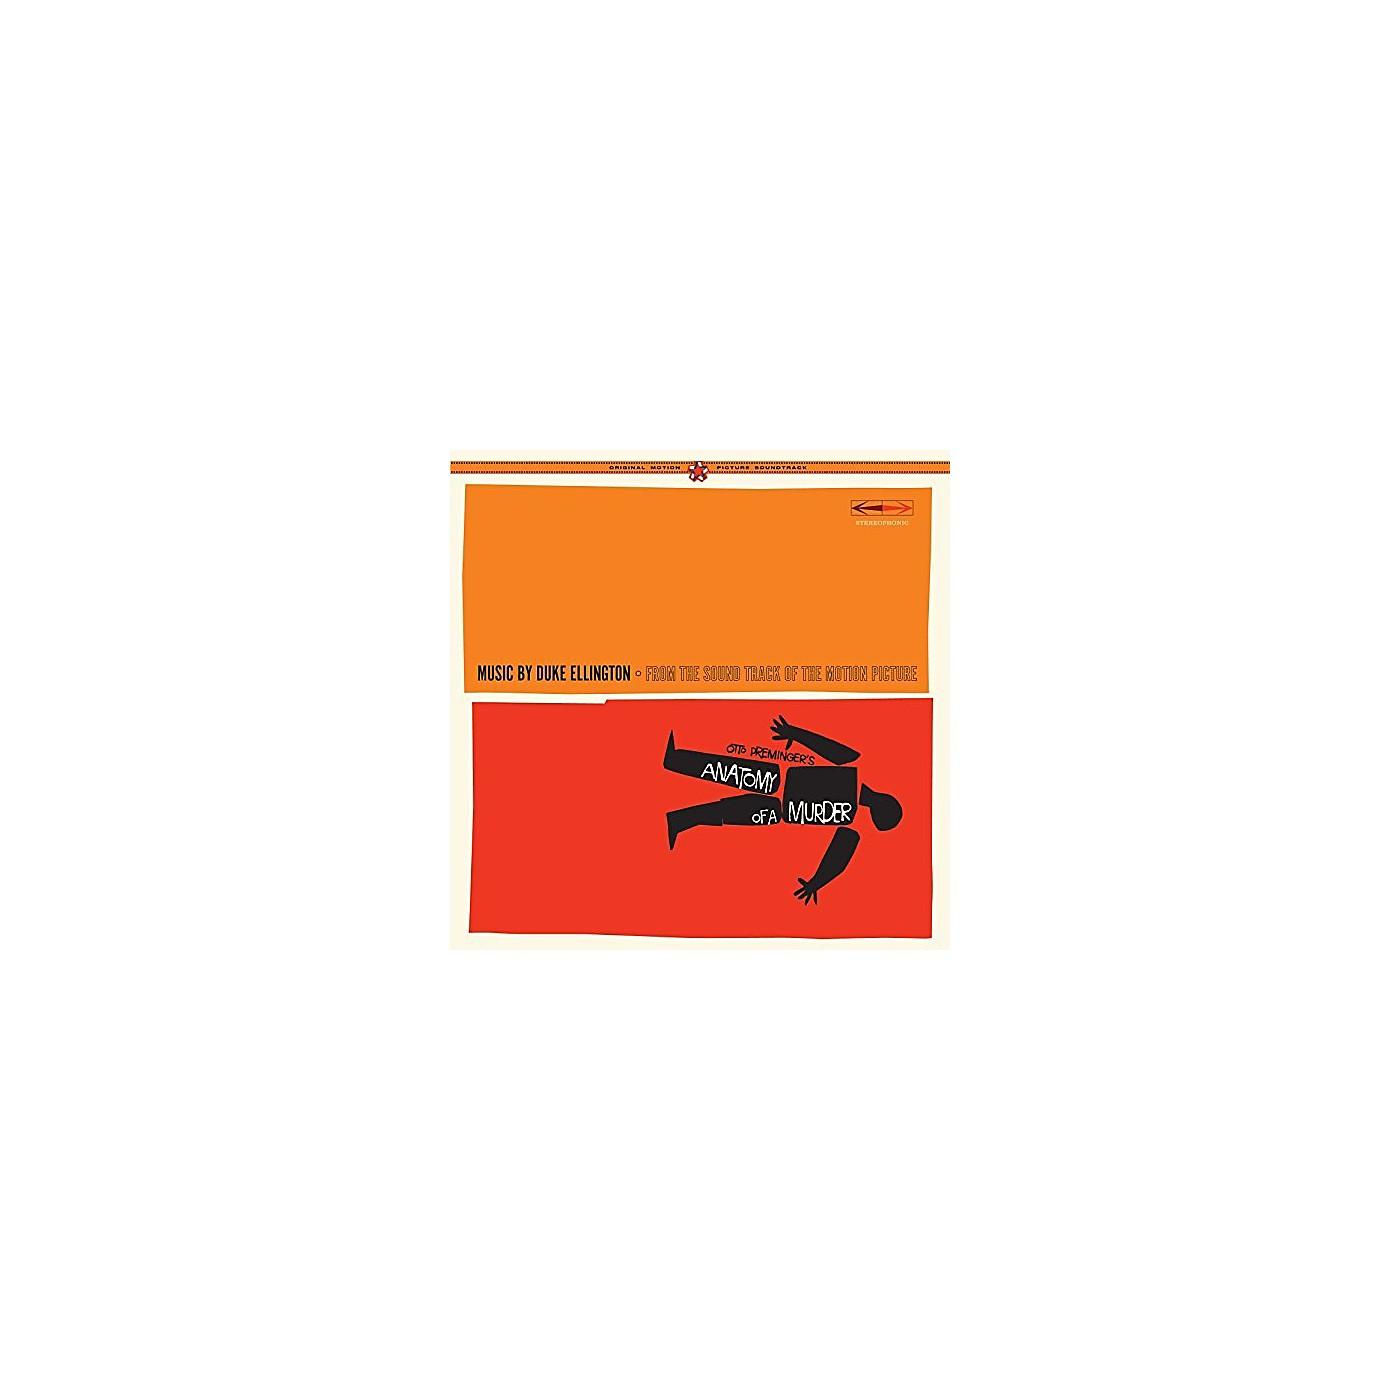 Alliance Duke Ellington & His Orchestra - Anatomy of a Murder (Original Motion Picturee Soundtrack) thumbnail